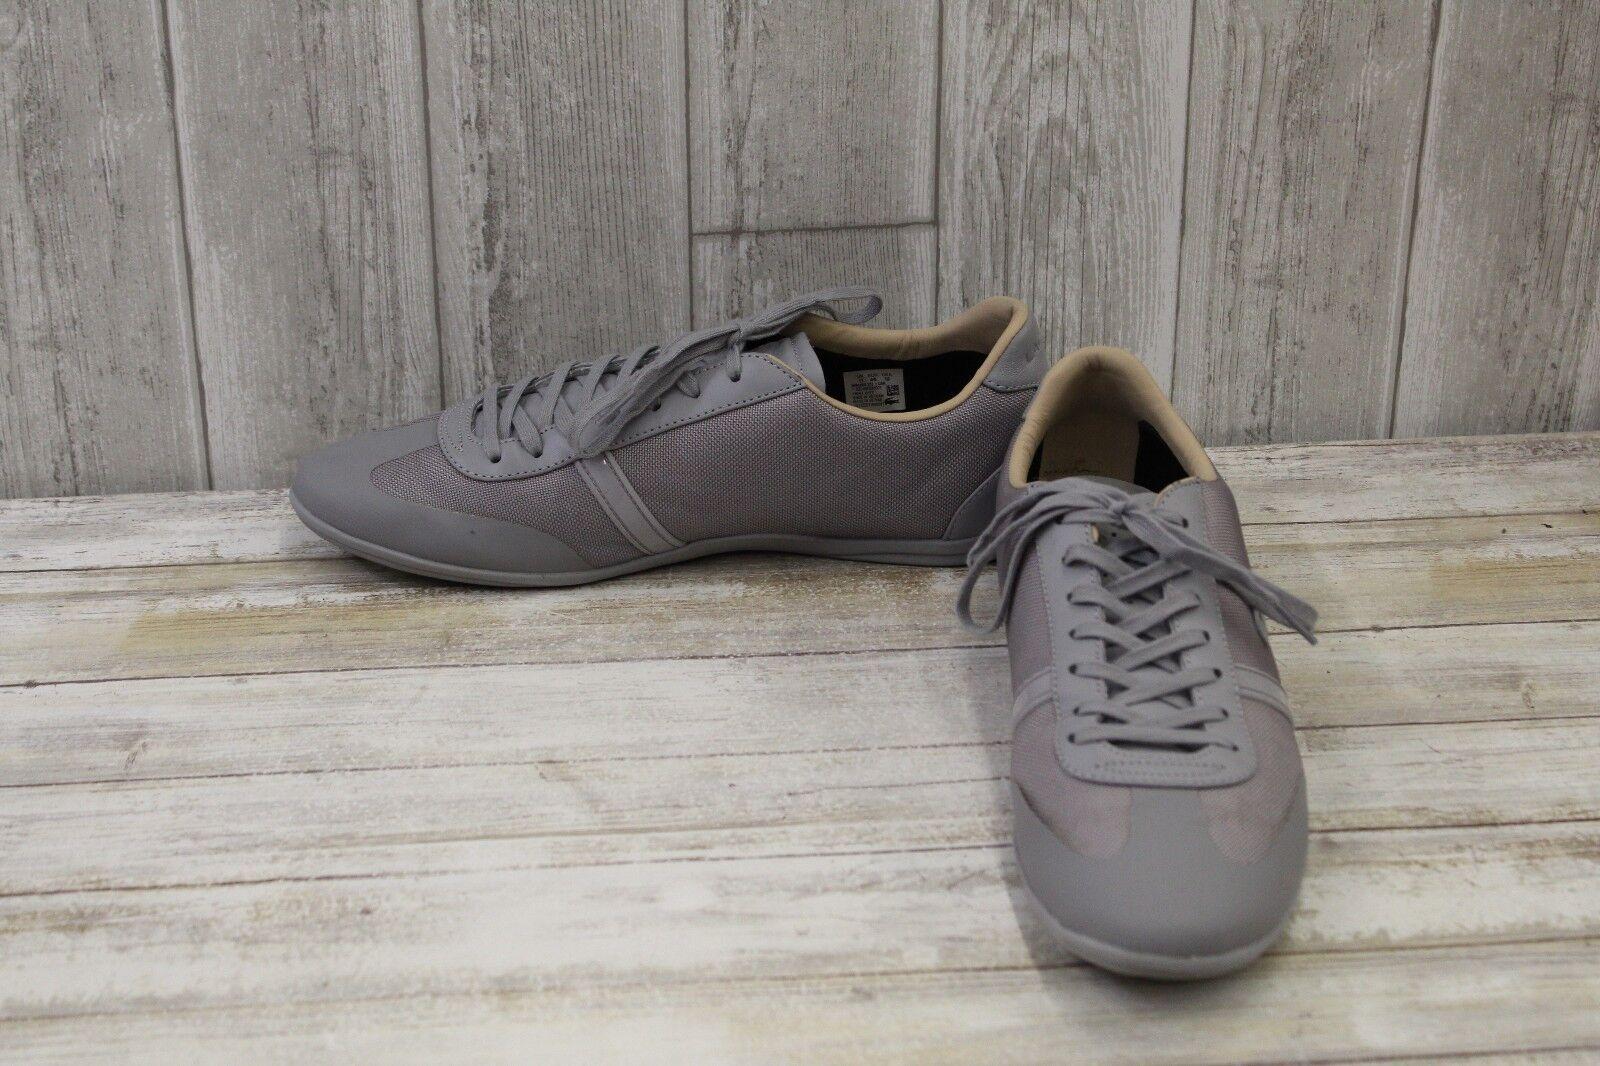 Lacoste Mokara 217 1 Fashion Sneakers-Men's sz 12 Grey